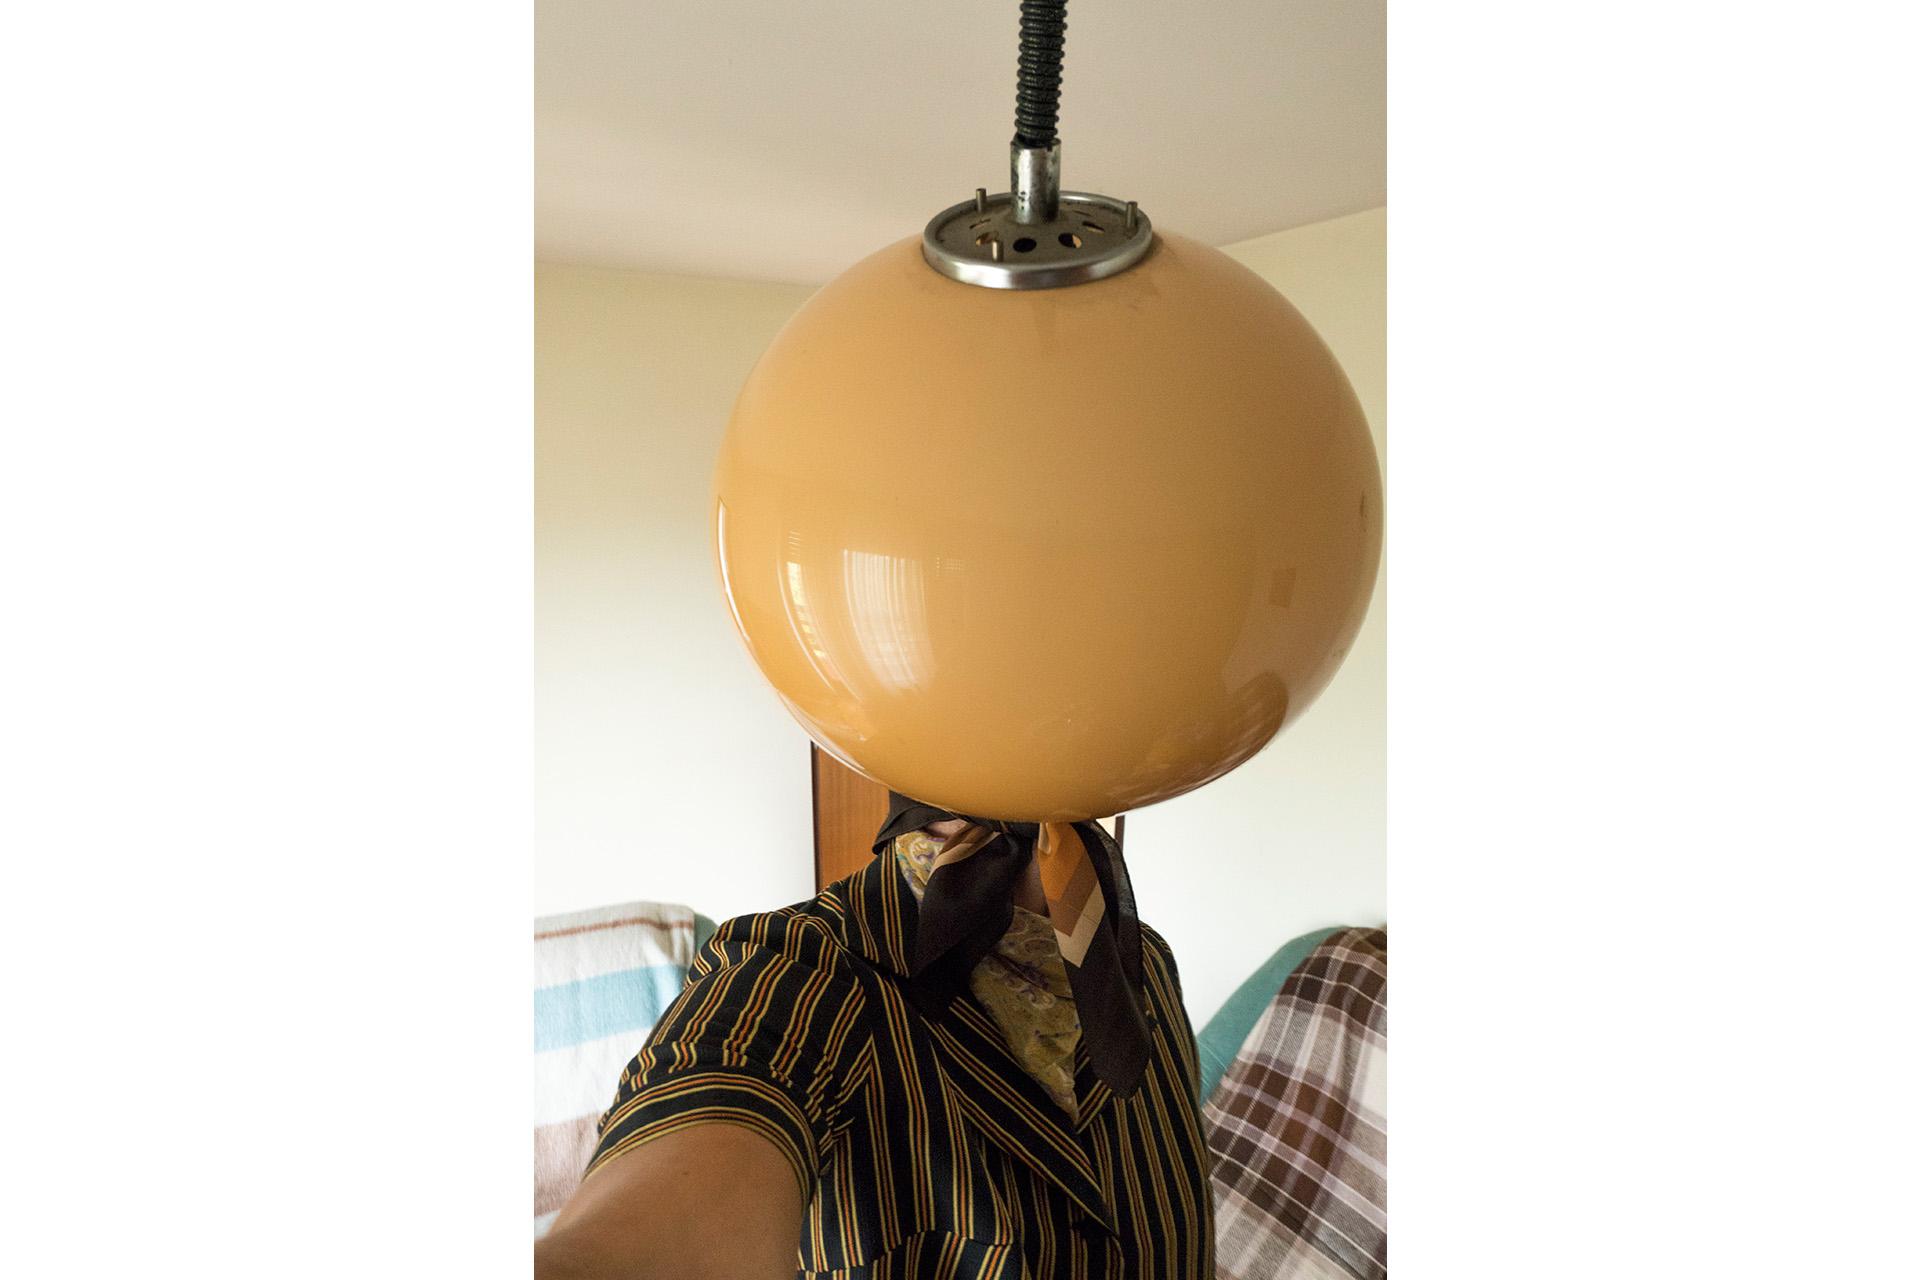 This was her modern chandelier